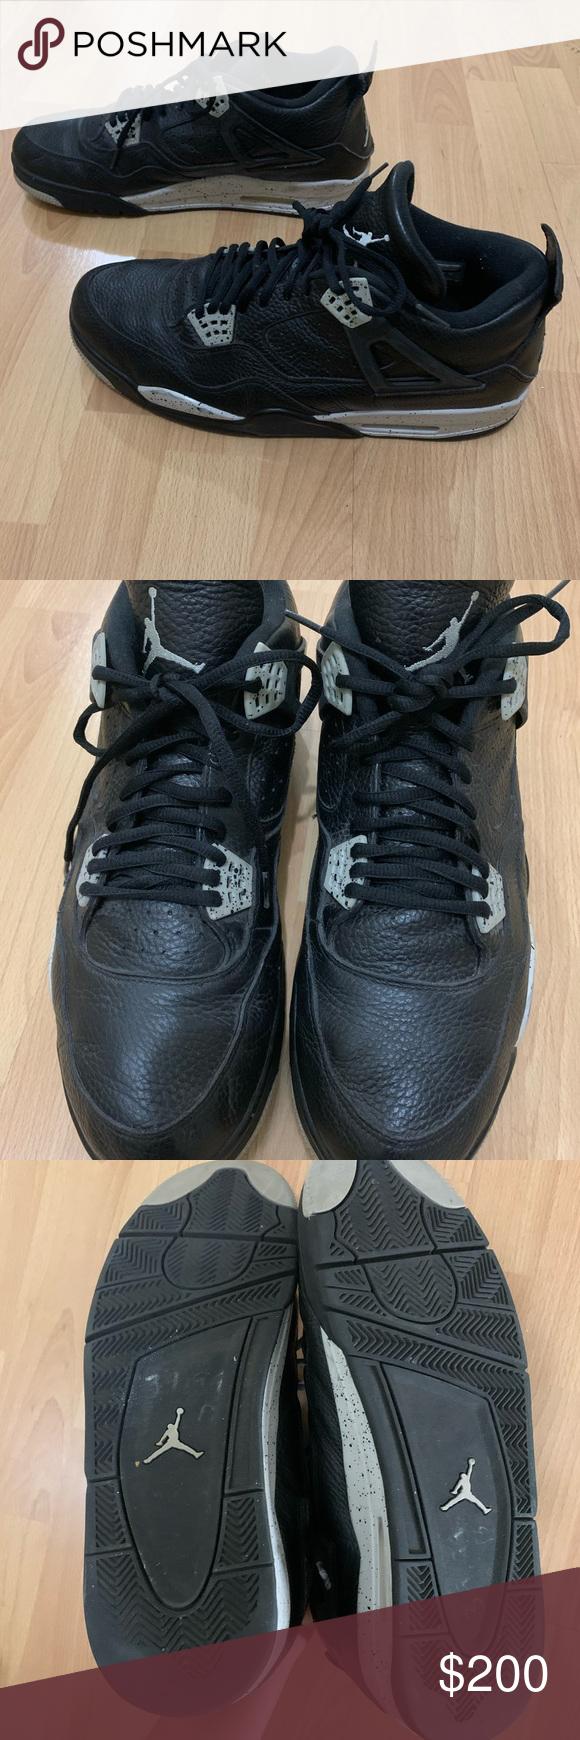 Nike air Jordan 4 IV retro Oreo men size 14 shoes Nike Air